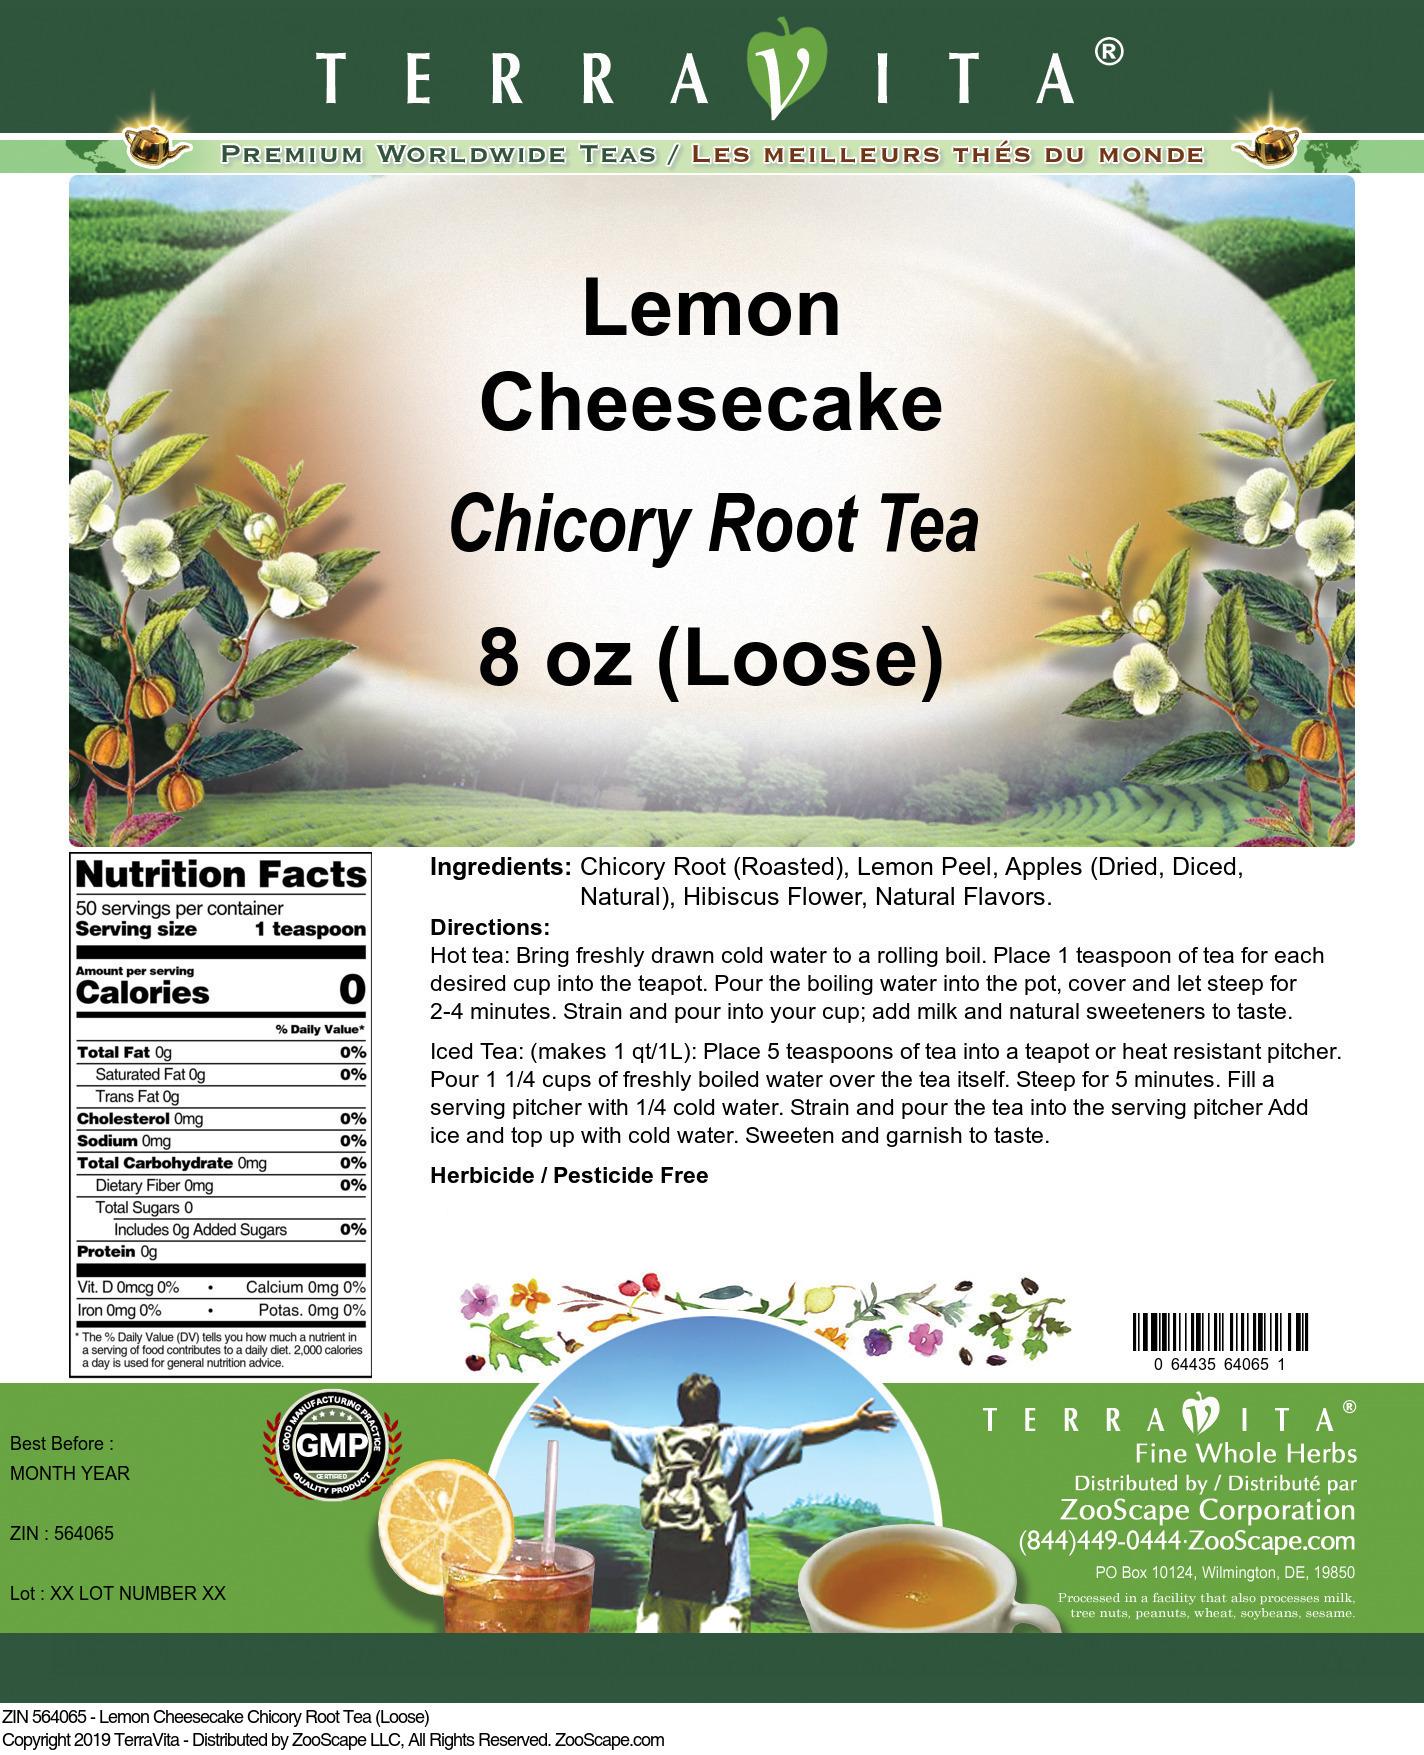 Lemon Cheesecake Chicory Root Tea (Loose)